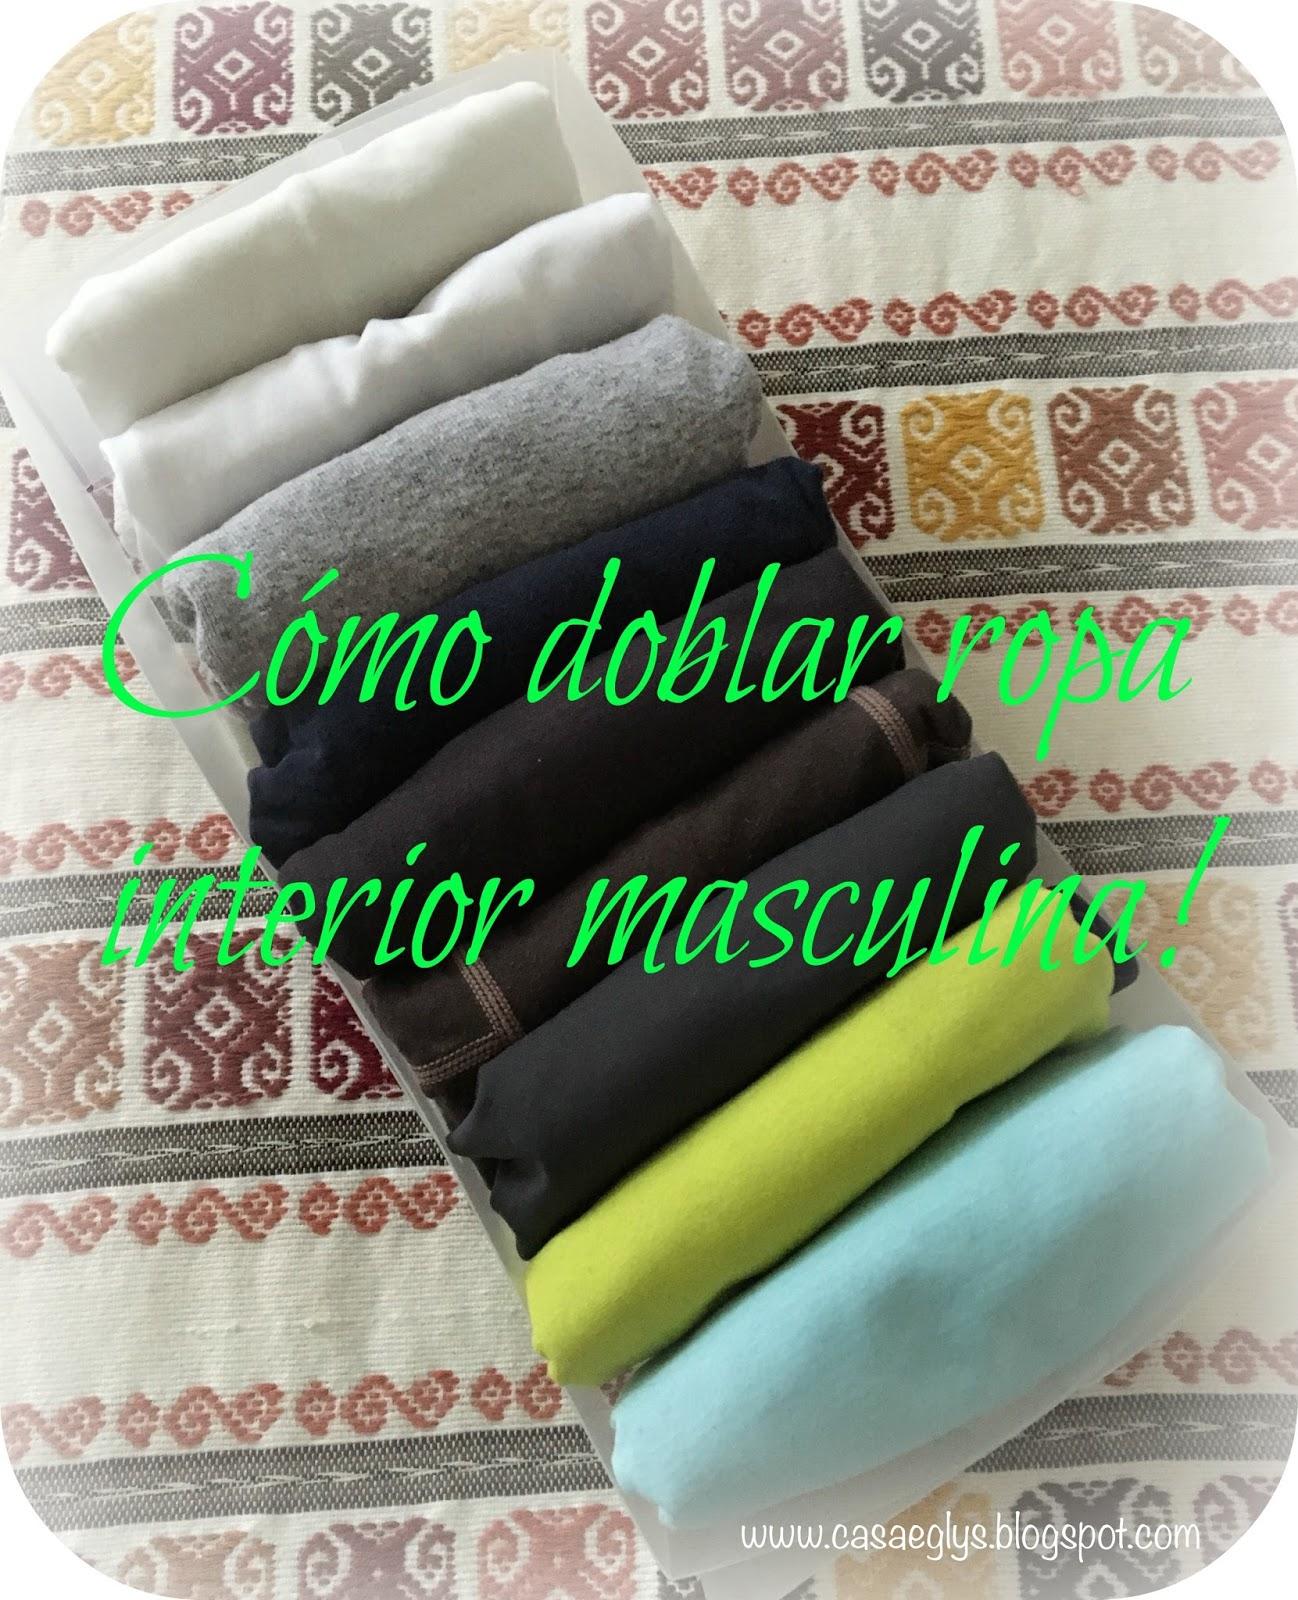 Casa eglys organizaci n c mo doblar ropa interior masculina - Como doblar ropa interior ...